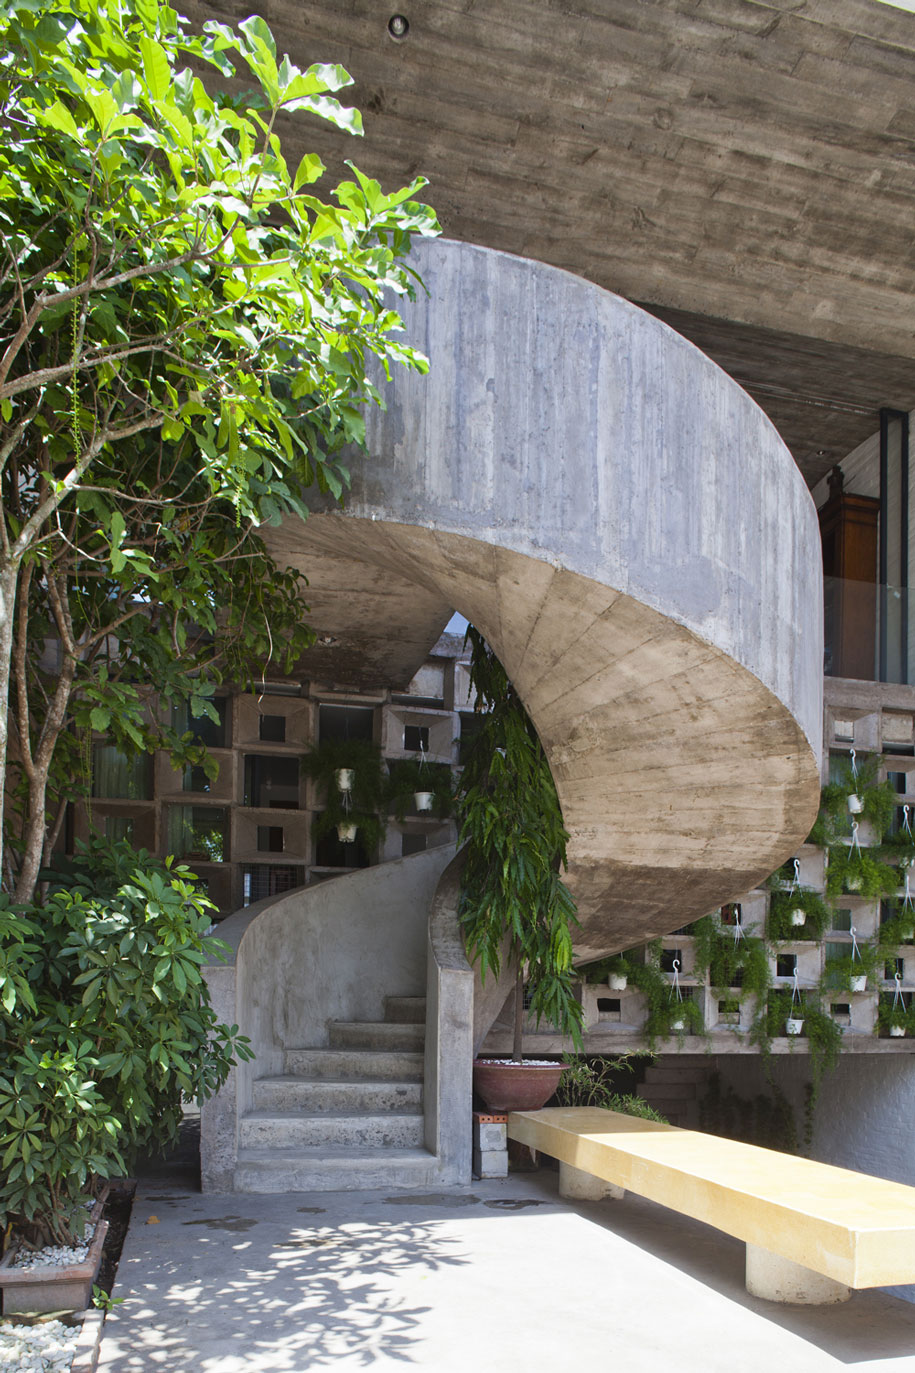 52156a94e8e44e7a180000bd_binh-thanh-house-vo-trong-nghia-architects-sanuki-nishizawa-architects_pic19-stair-1f-2f